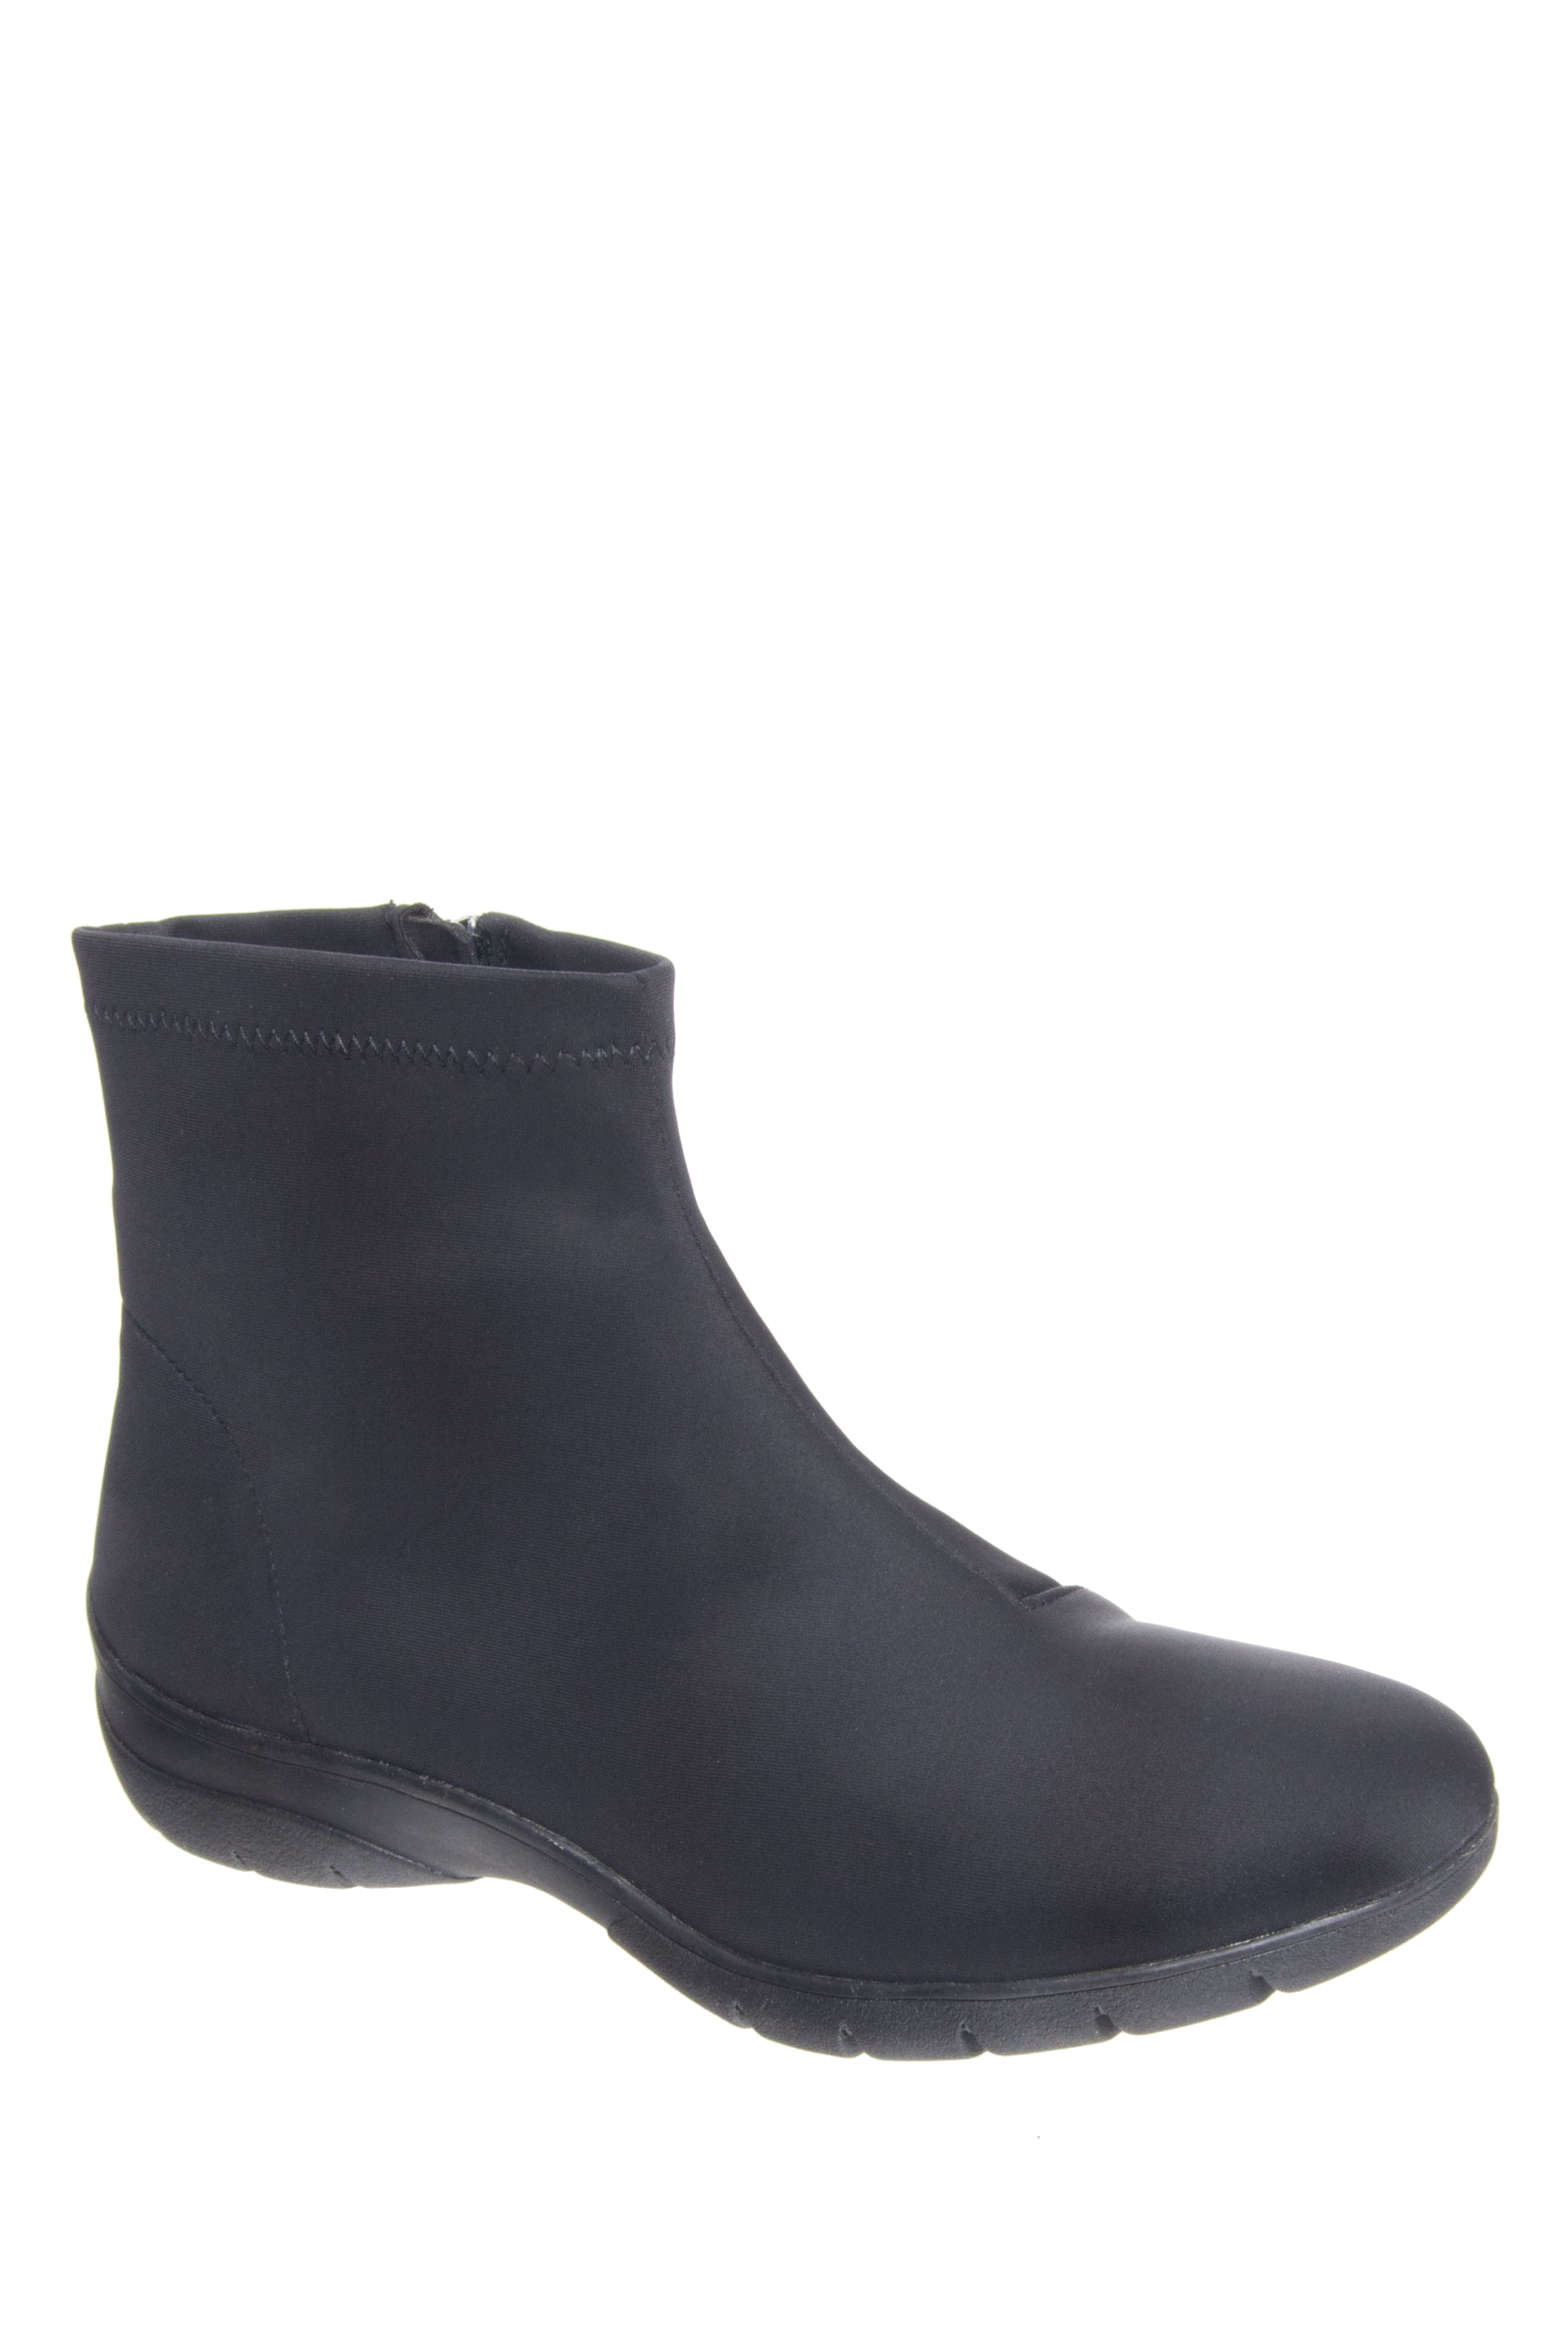 Bussola Klara Low Wedge Boots - Black